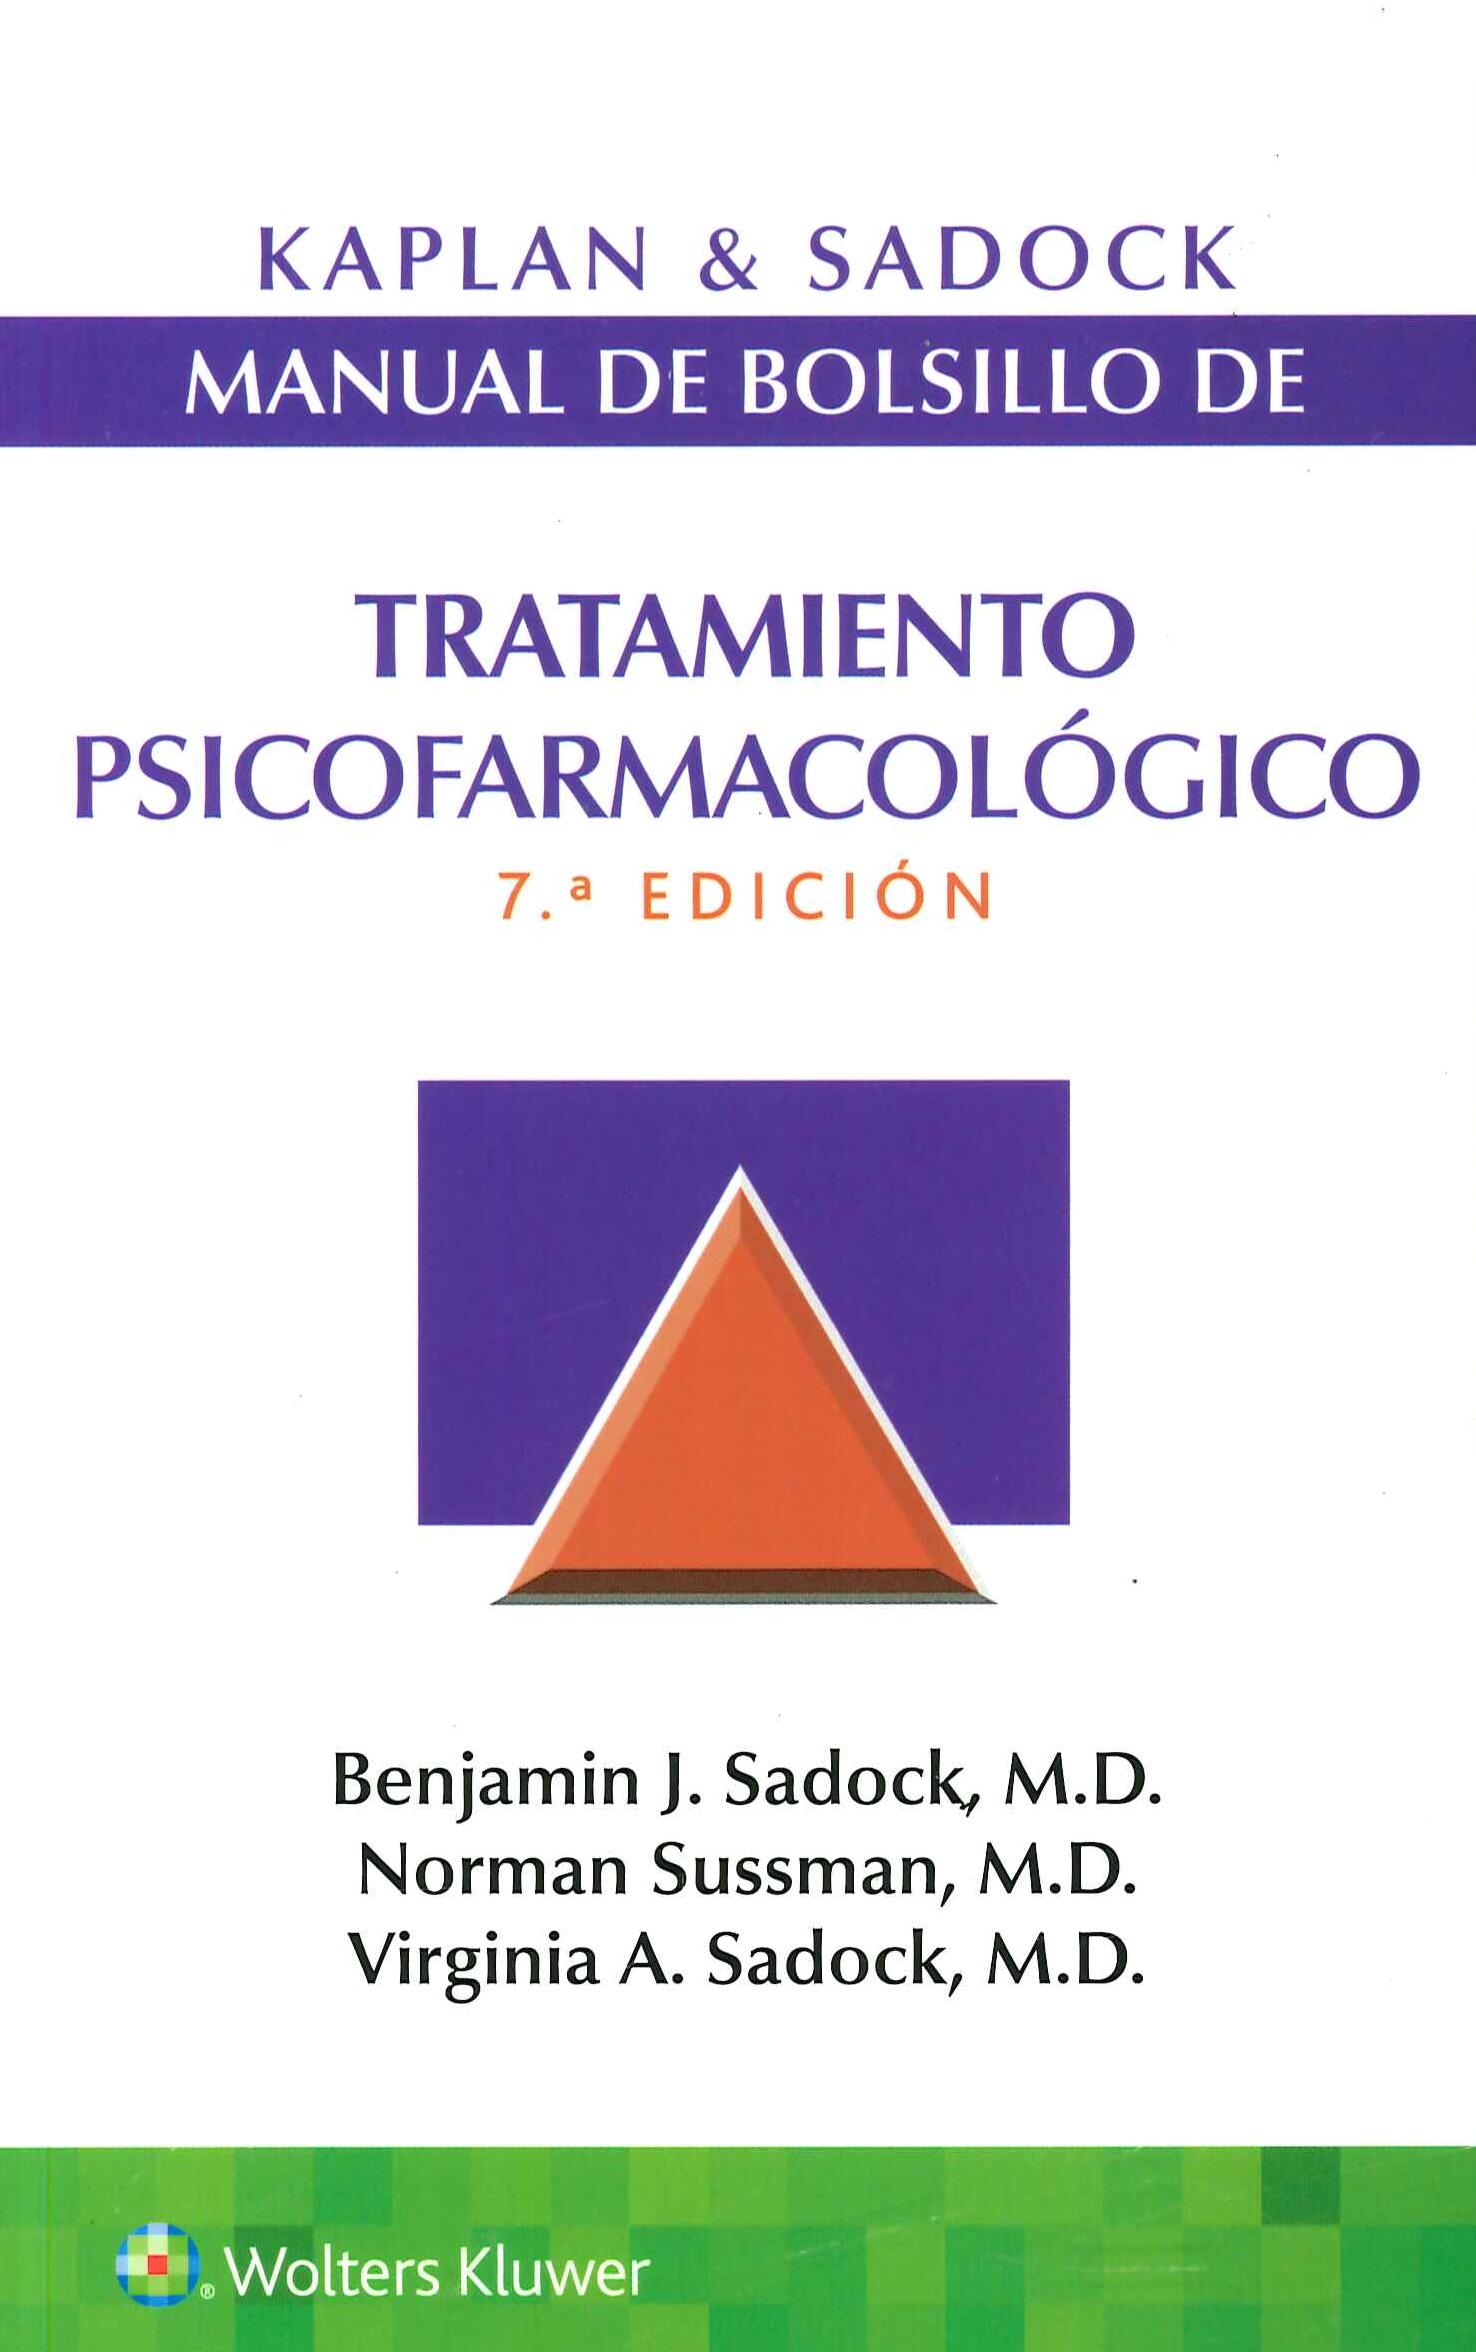 Tratamiento Psicofarmacológico Manual de Bolsillo Kaplan & Sadock